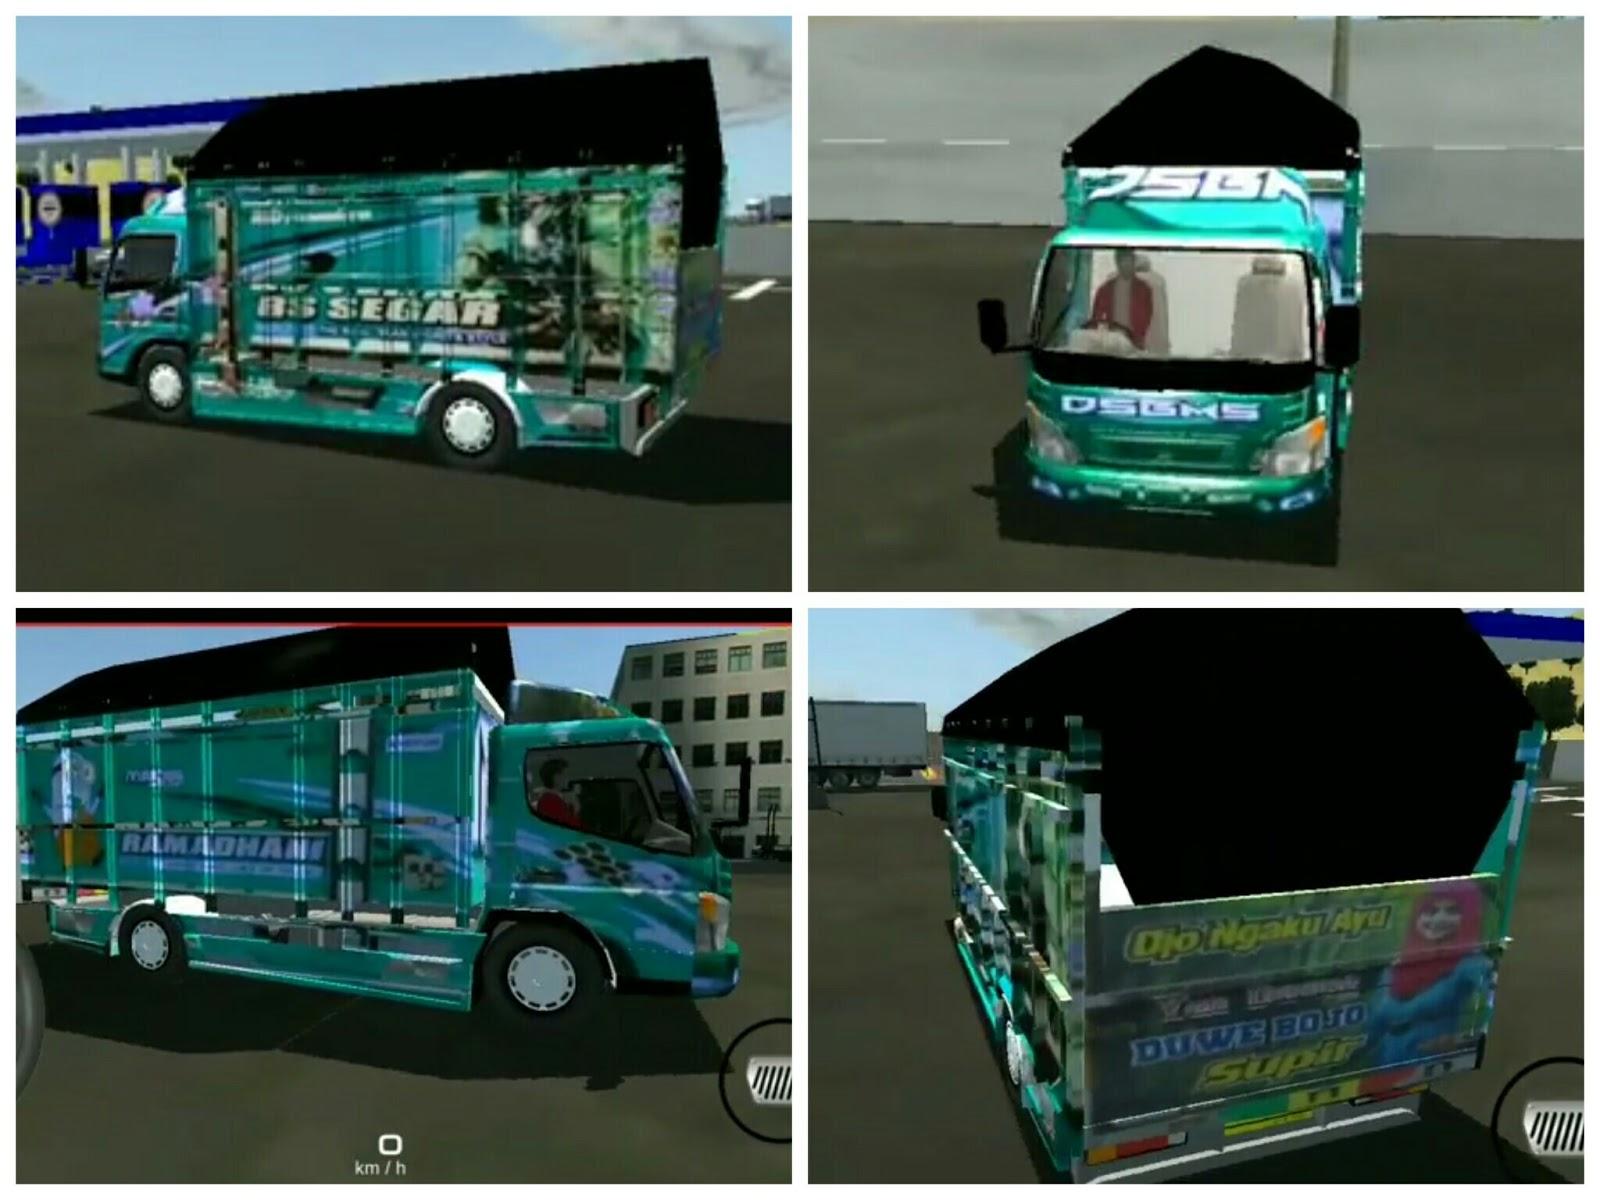 Livery Idbs Truck Canter Minion Idbs Truck Simulator Gudang Livery Skin Dan Mod Bus Simulator Indonesia